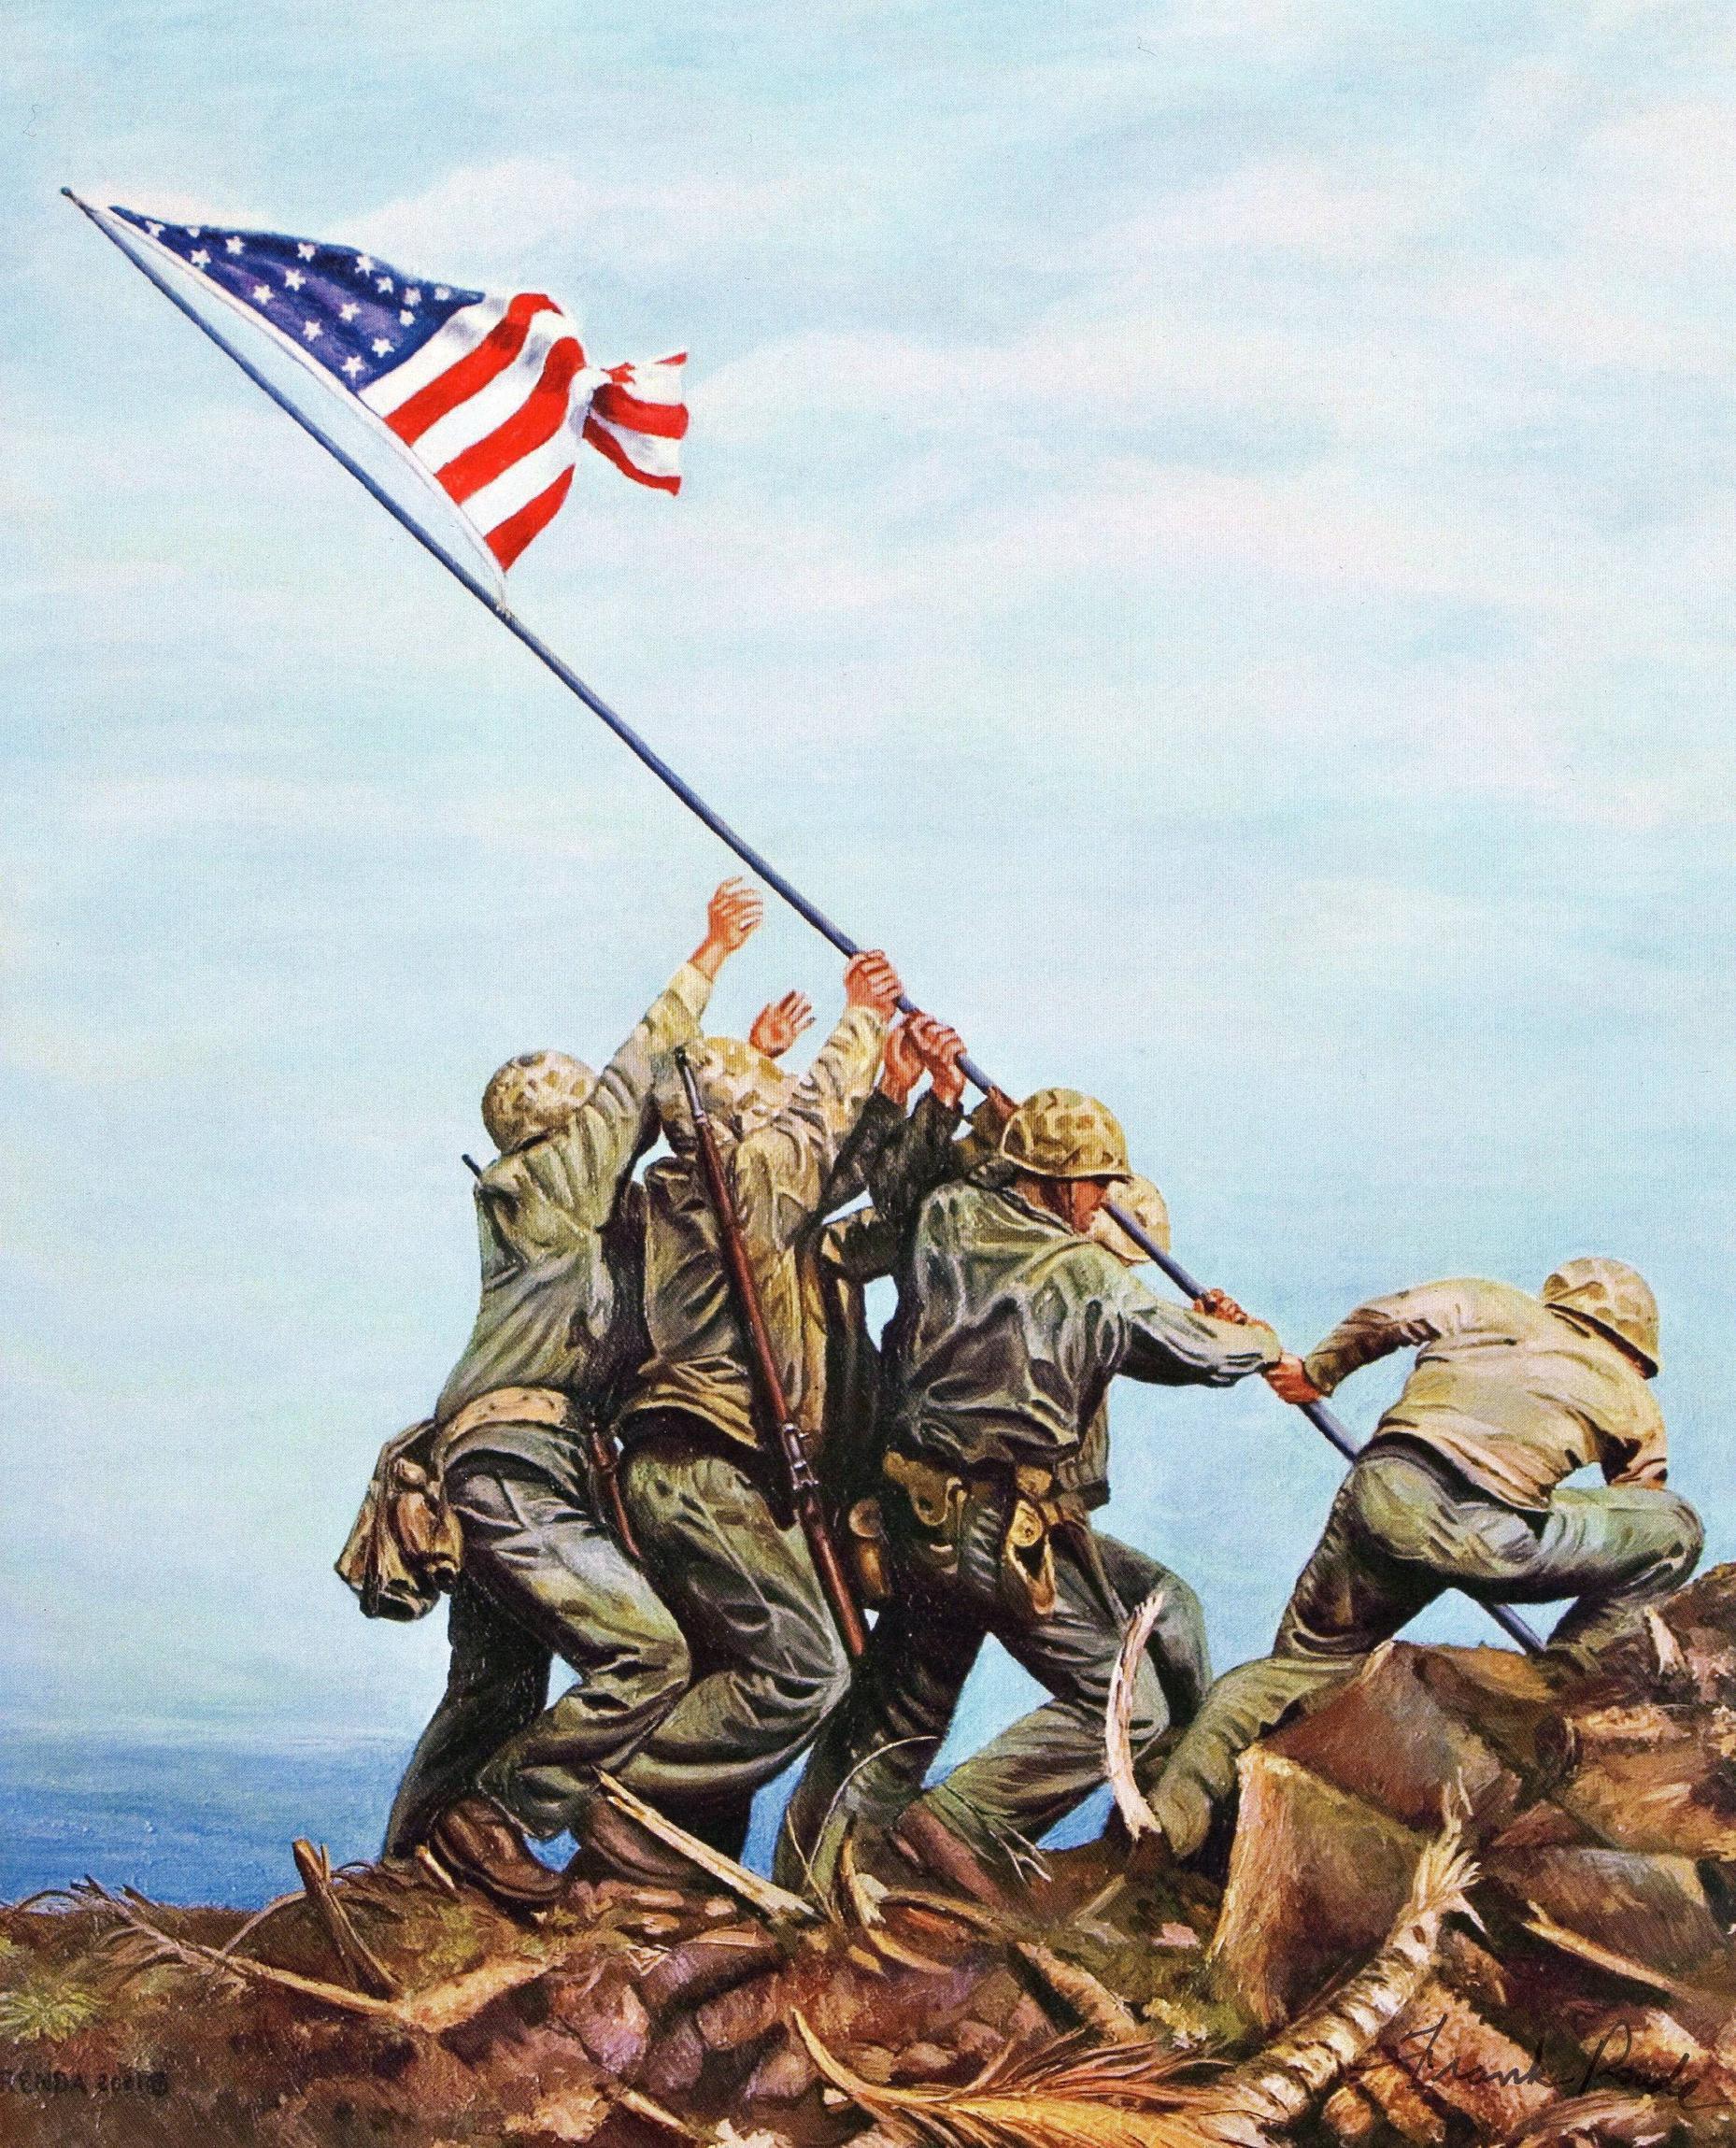 Iwo jima flag raising wallpapers wallpaper cave for Iwo jima tattoo